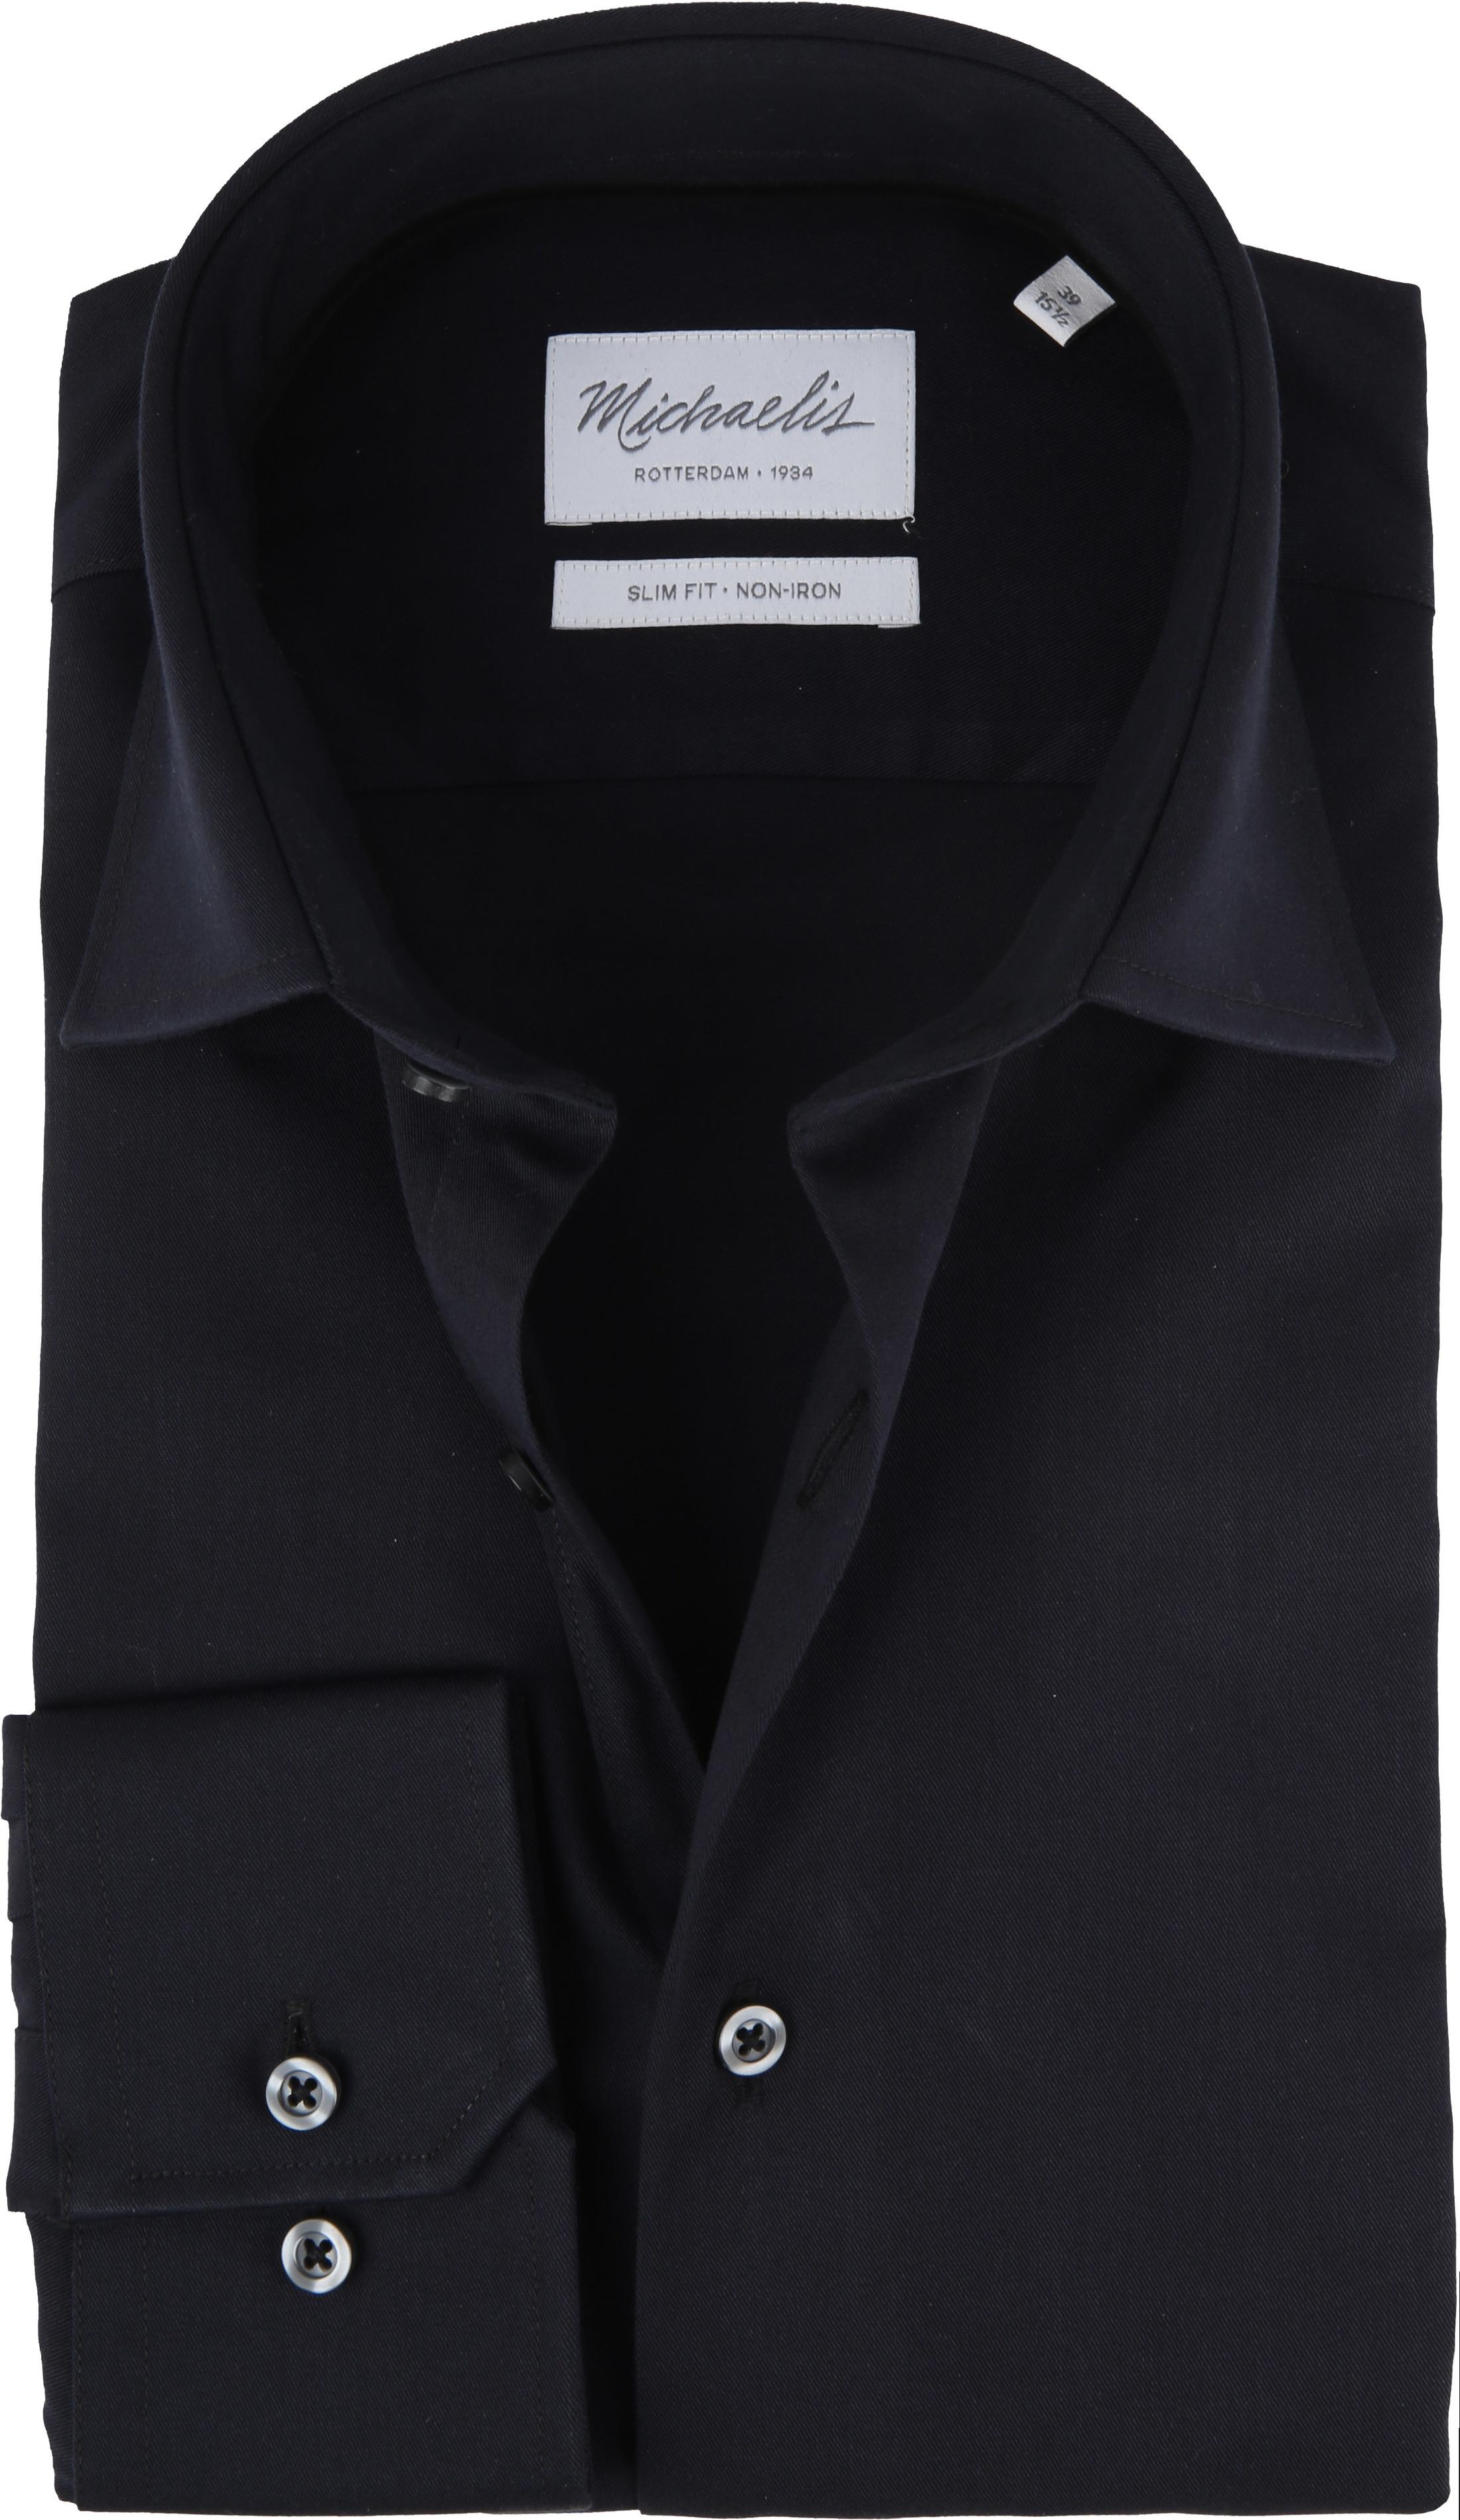 Michaelis Overhemd Slim Fit Zwart foto 0